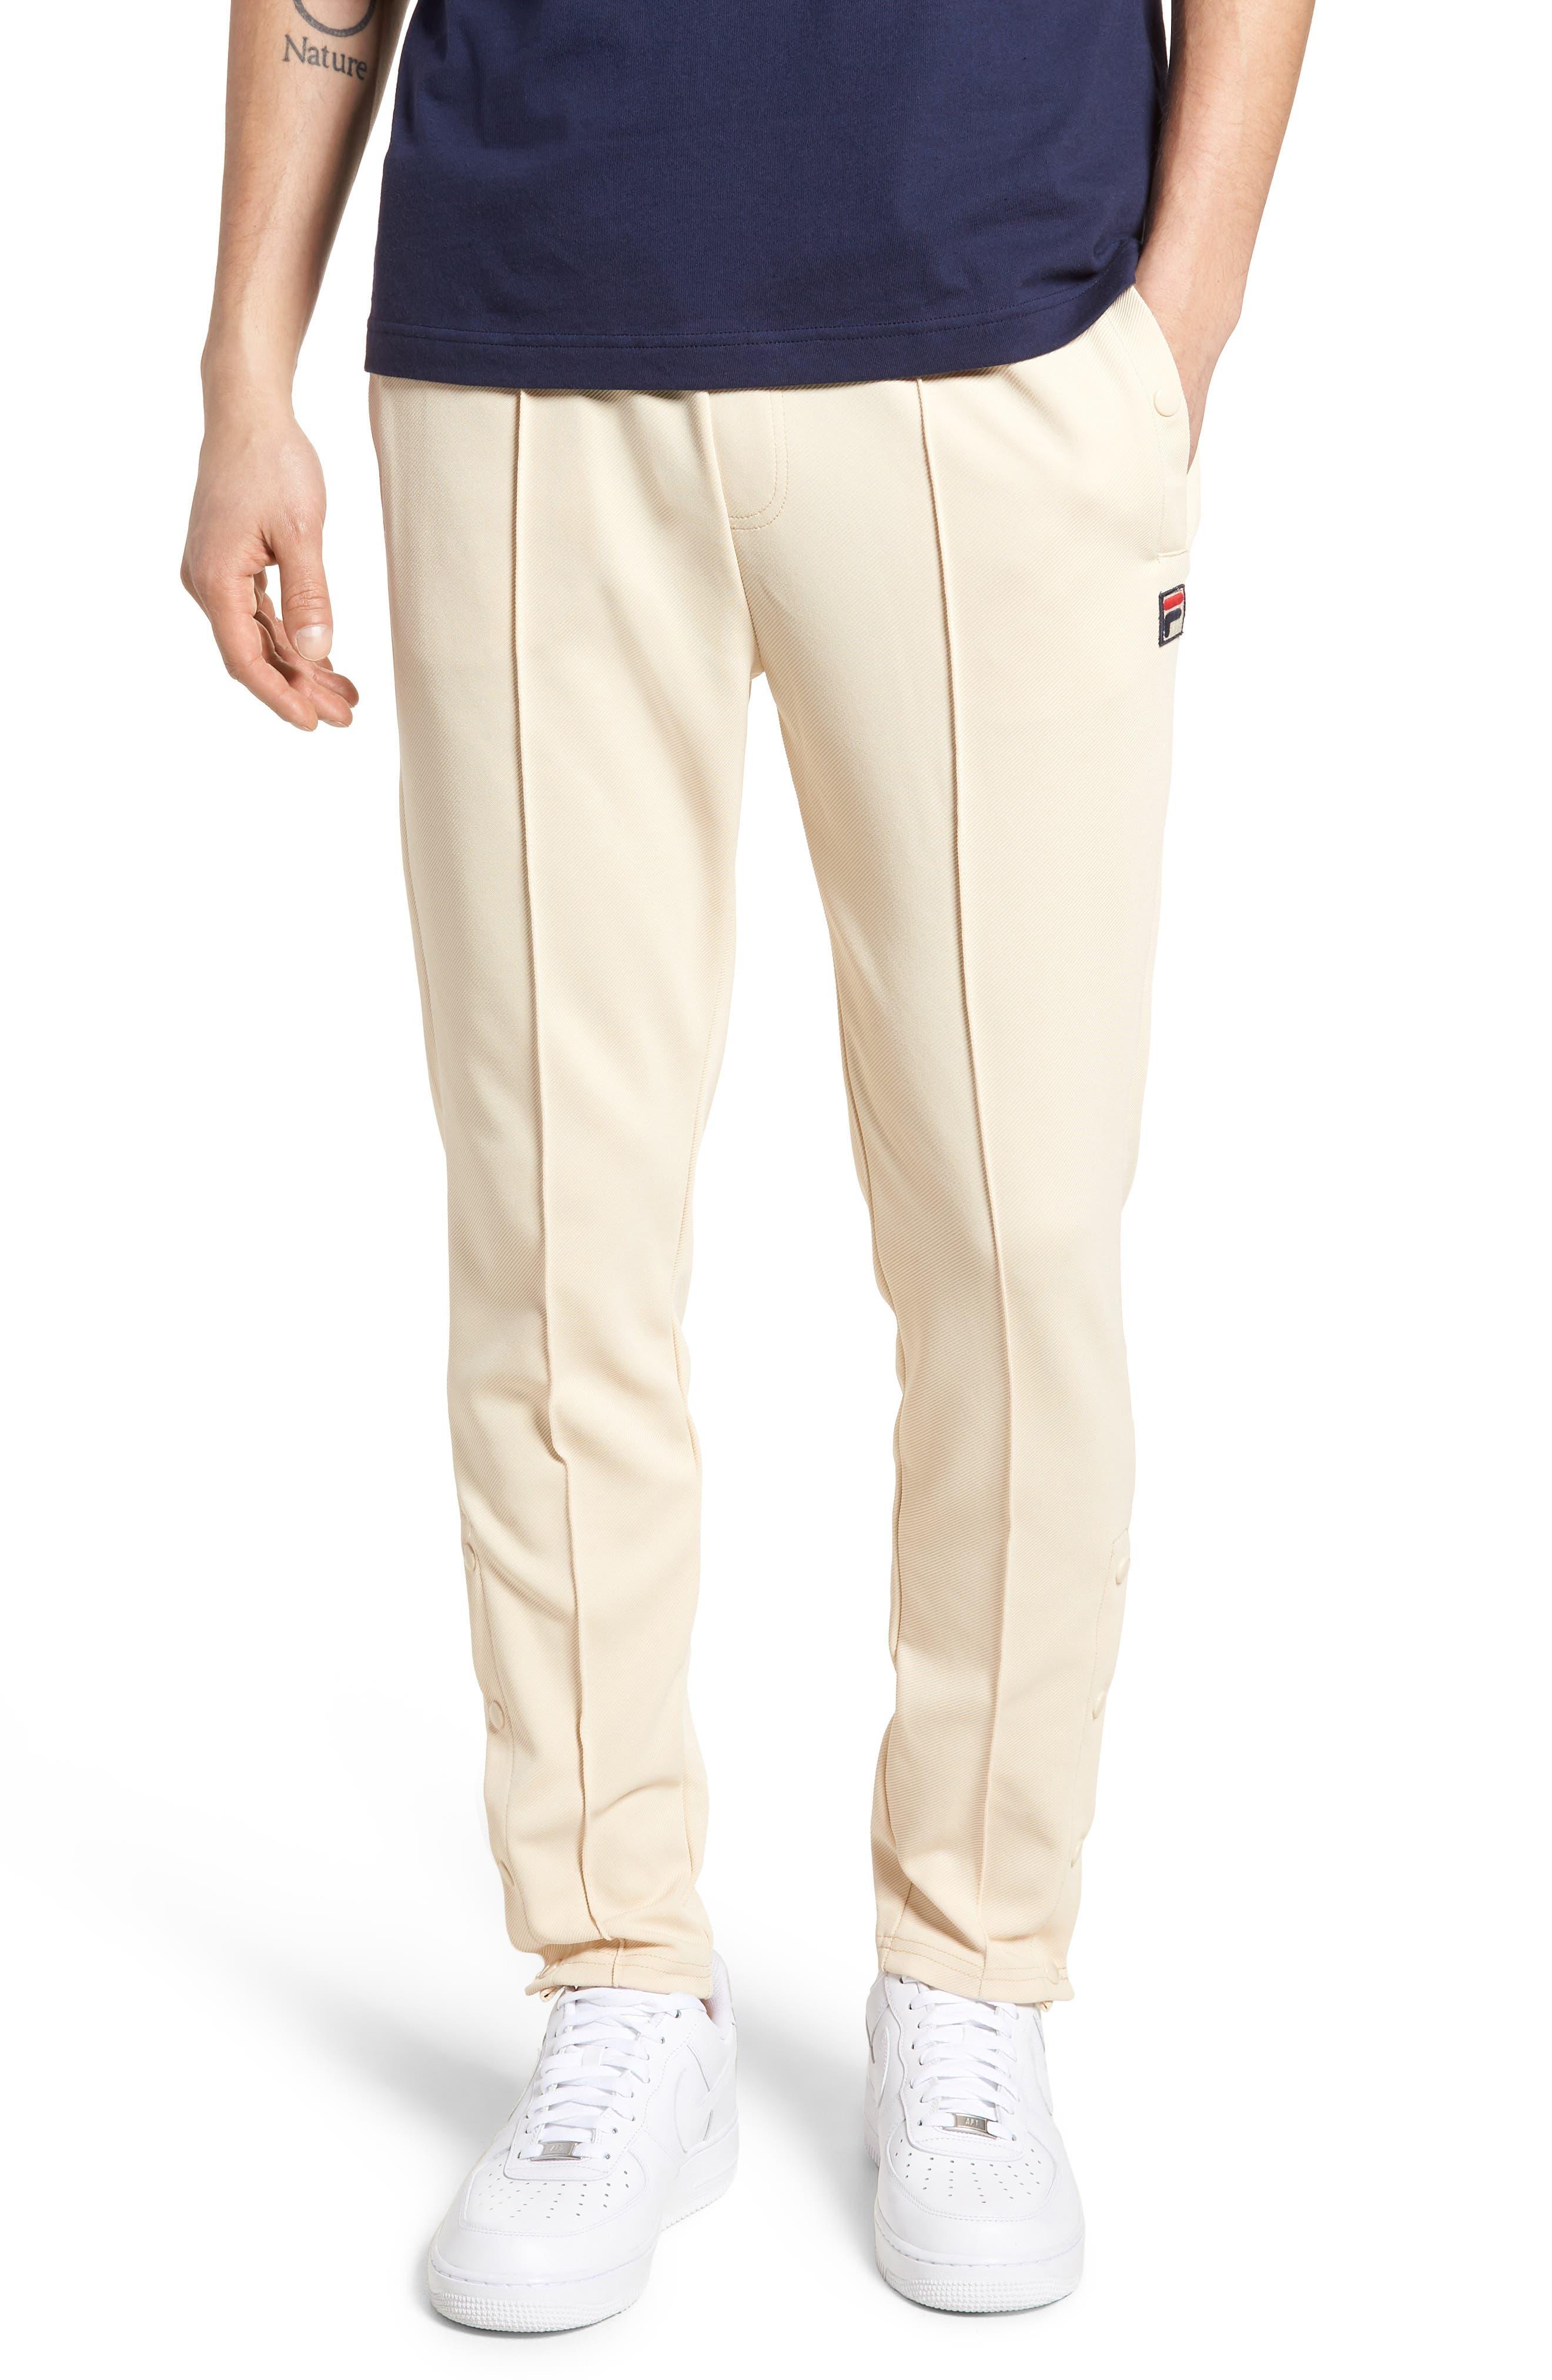 Molveno 2 Pants,                         Main,                         color, 250